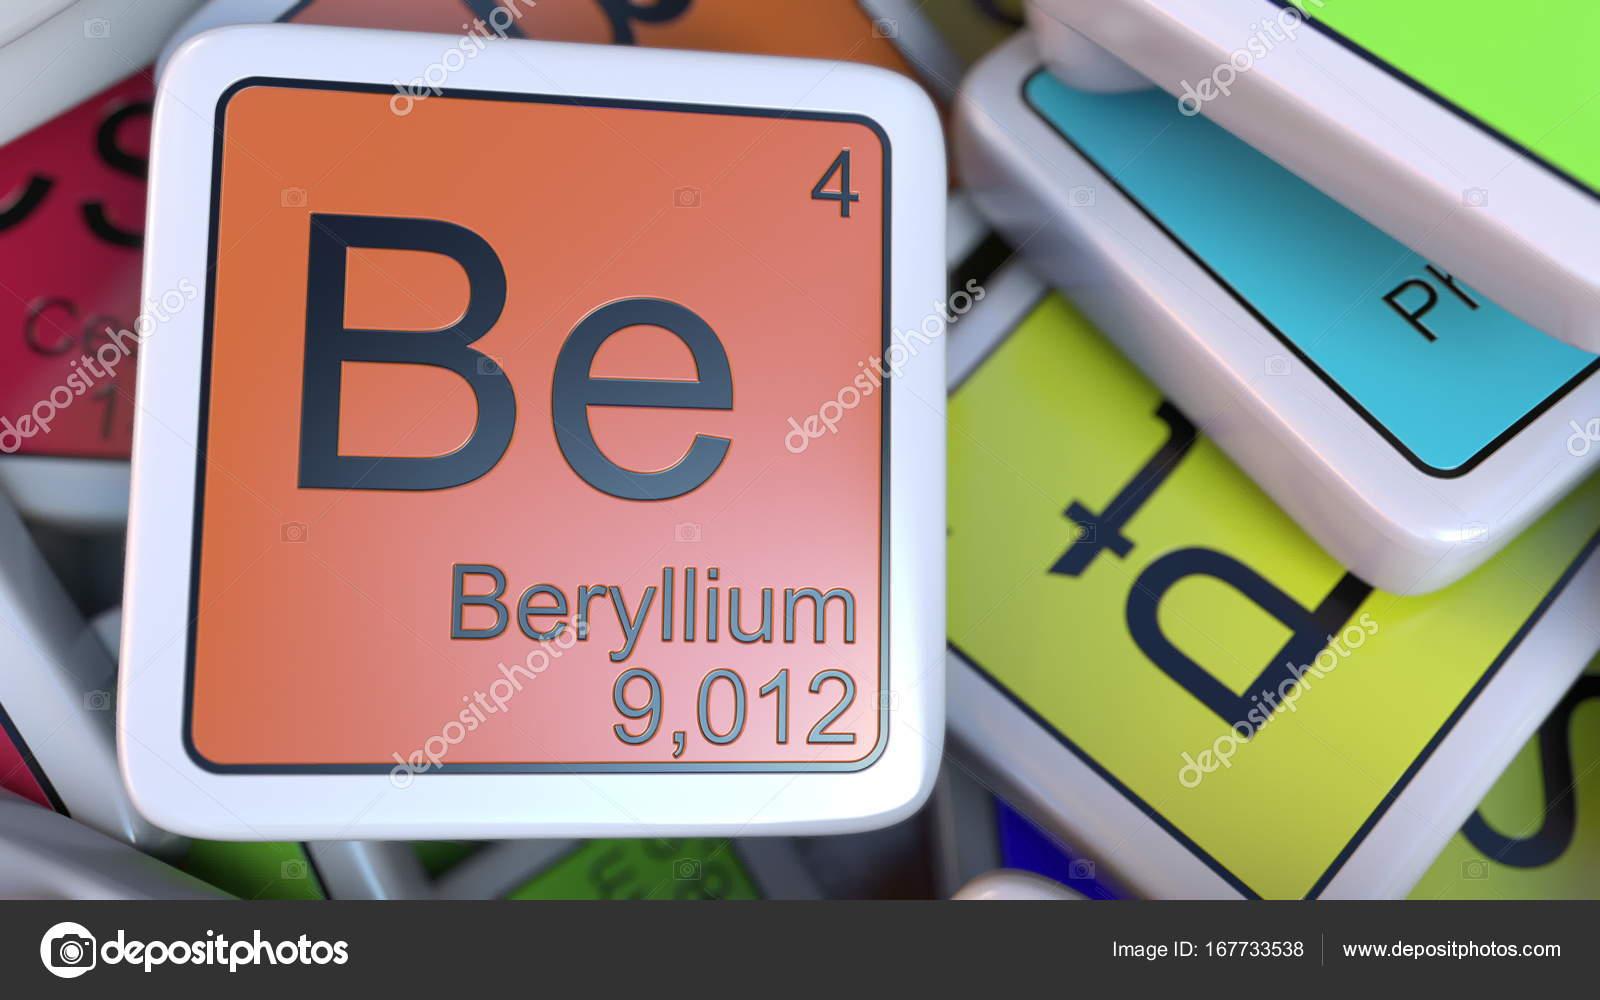 Bloque de berilio en la pila de la tabla peridica de los bloques de berilio de la etiqueta de la pila de la tabla peridica de las etiquetas de elementos qumicos foto de alexeynovikov urtaz Gallery